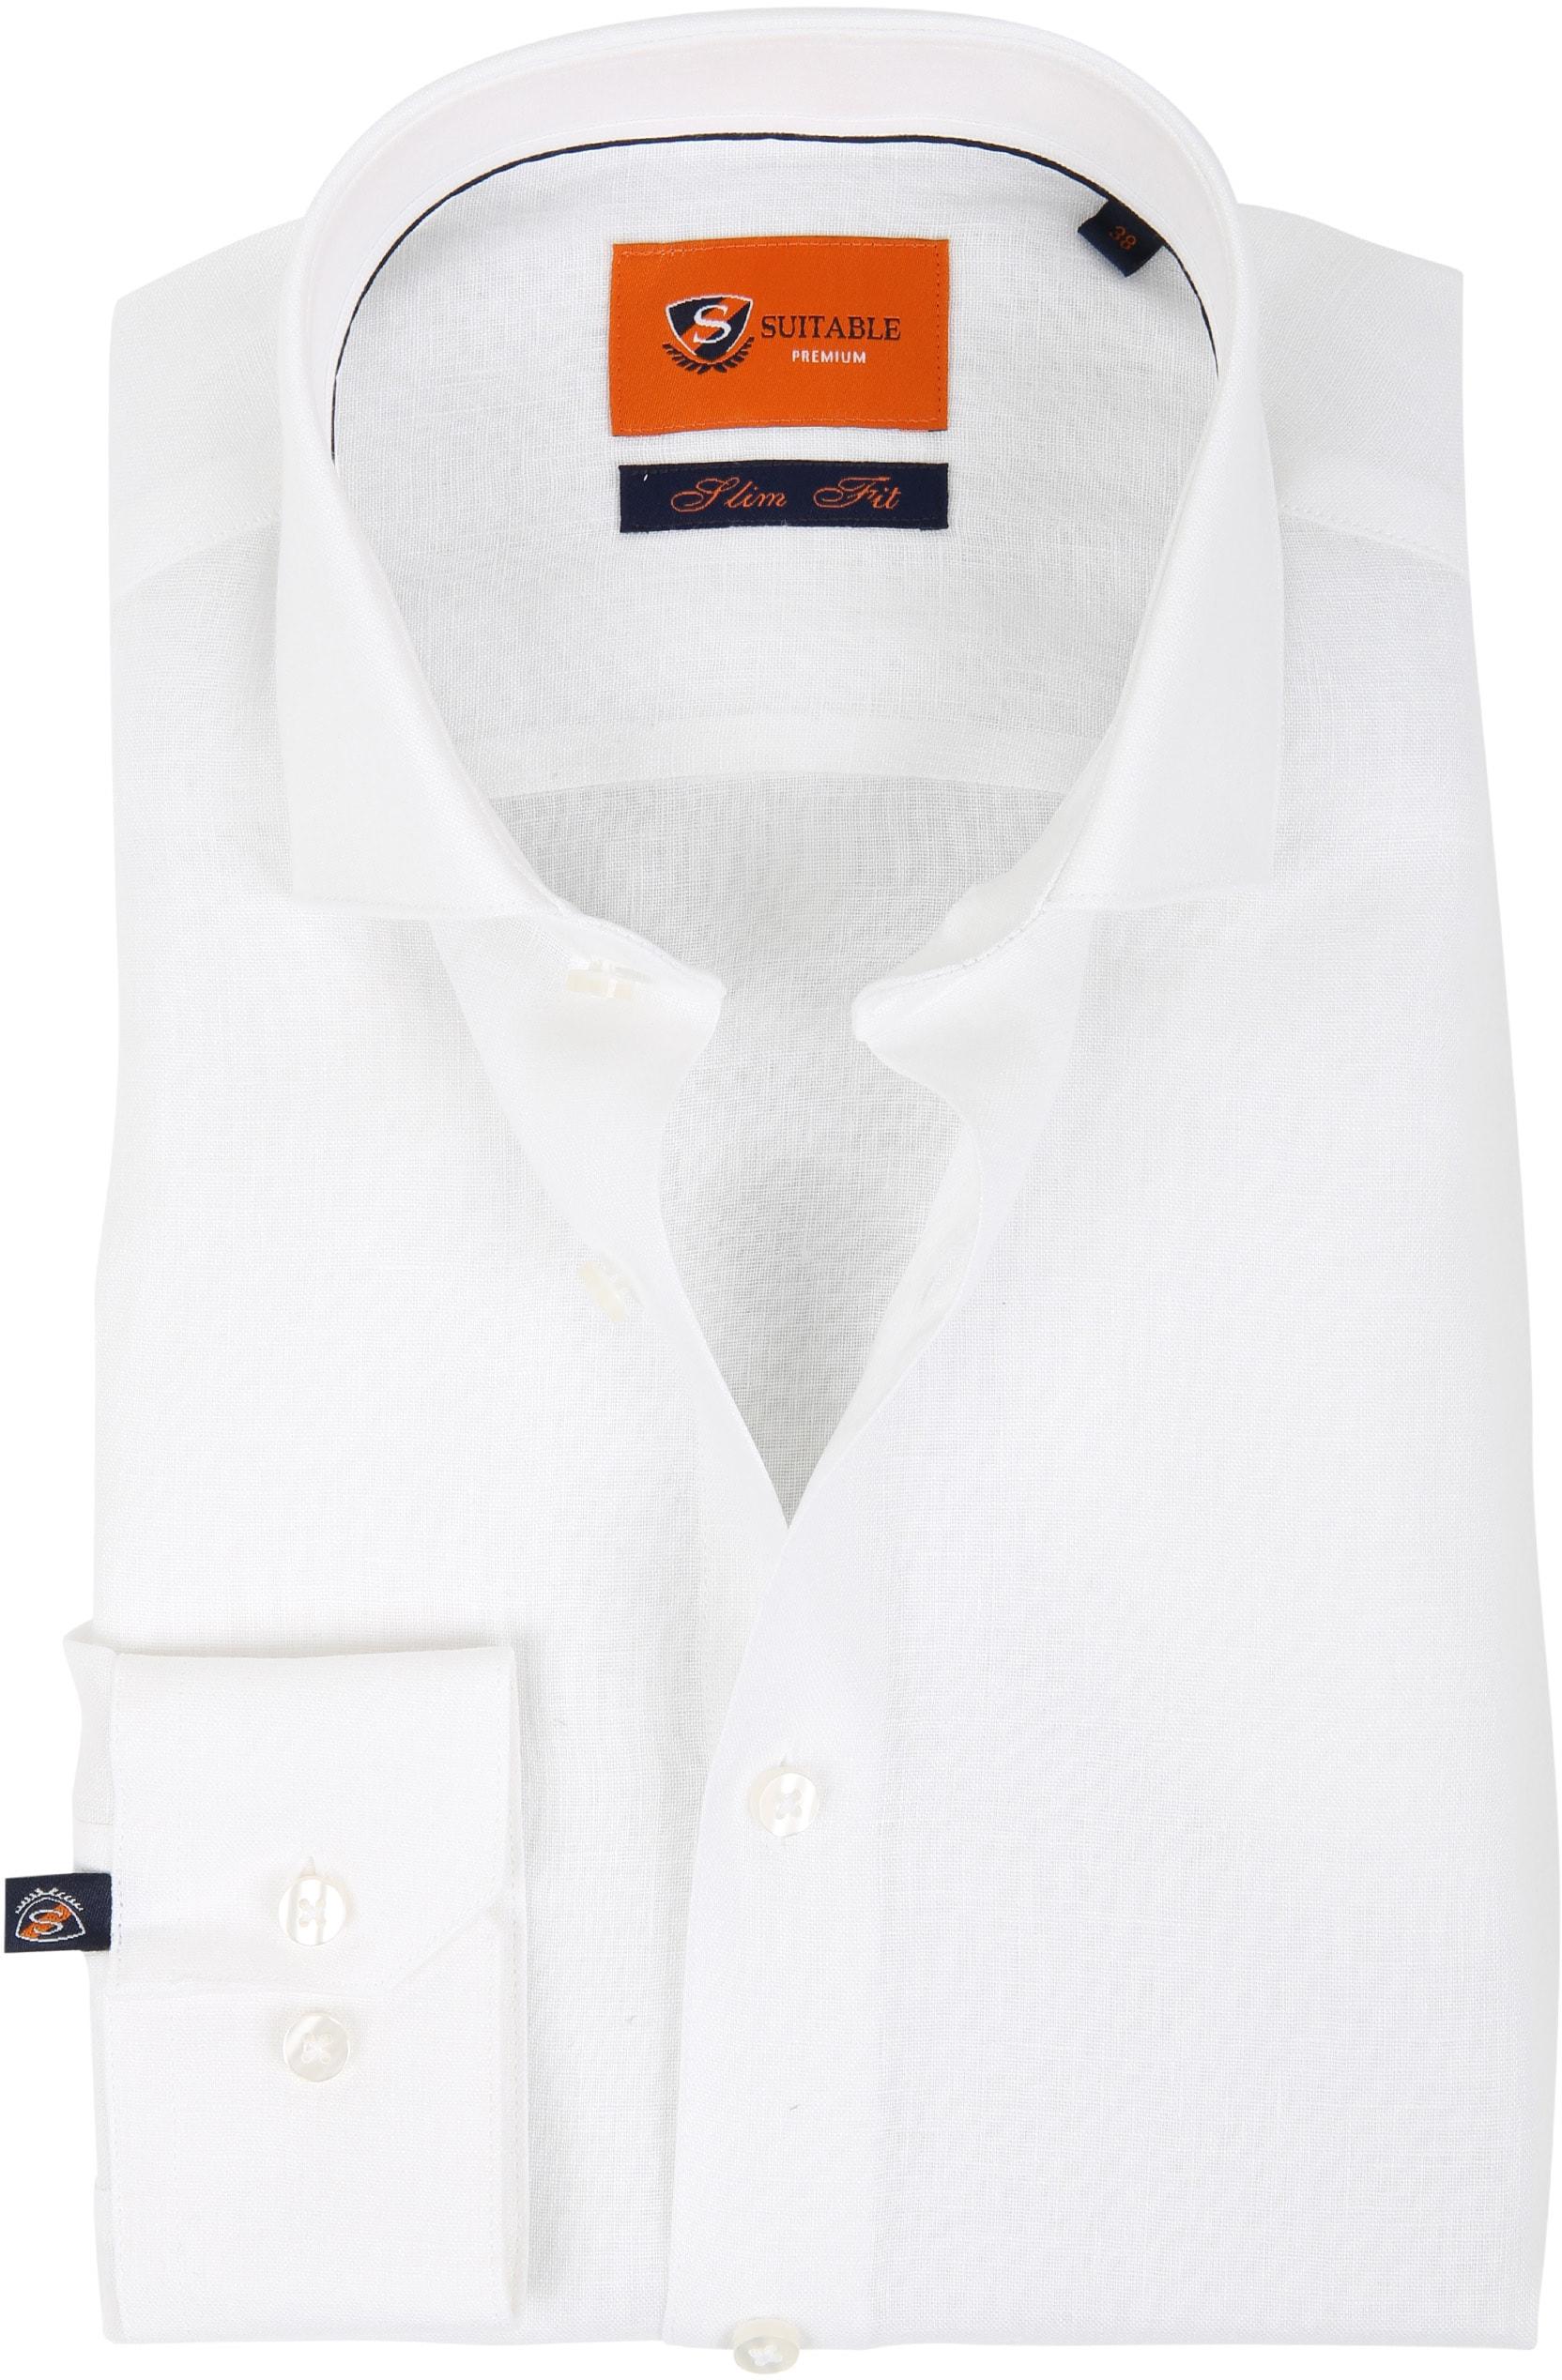 Suitable Hemd Leinen Weiß D81-13 foto 0